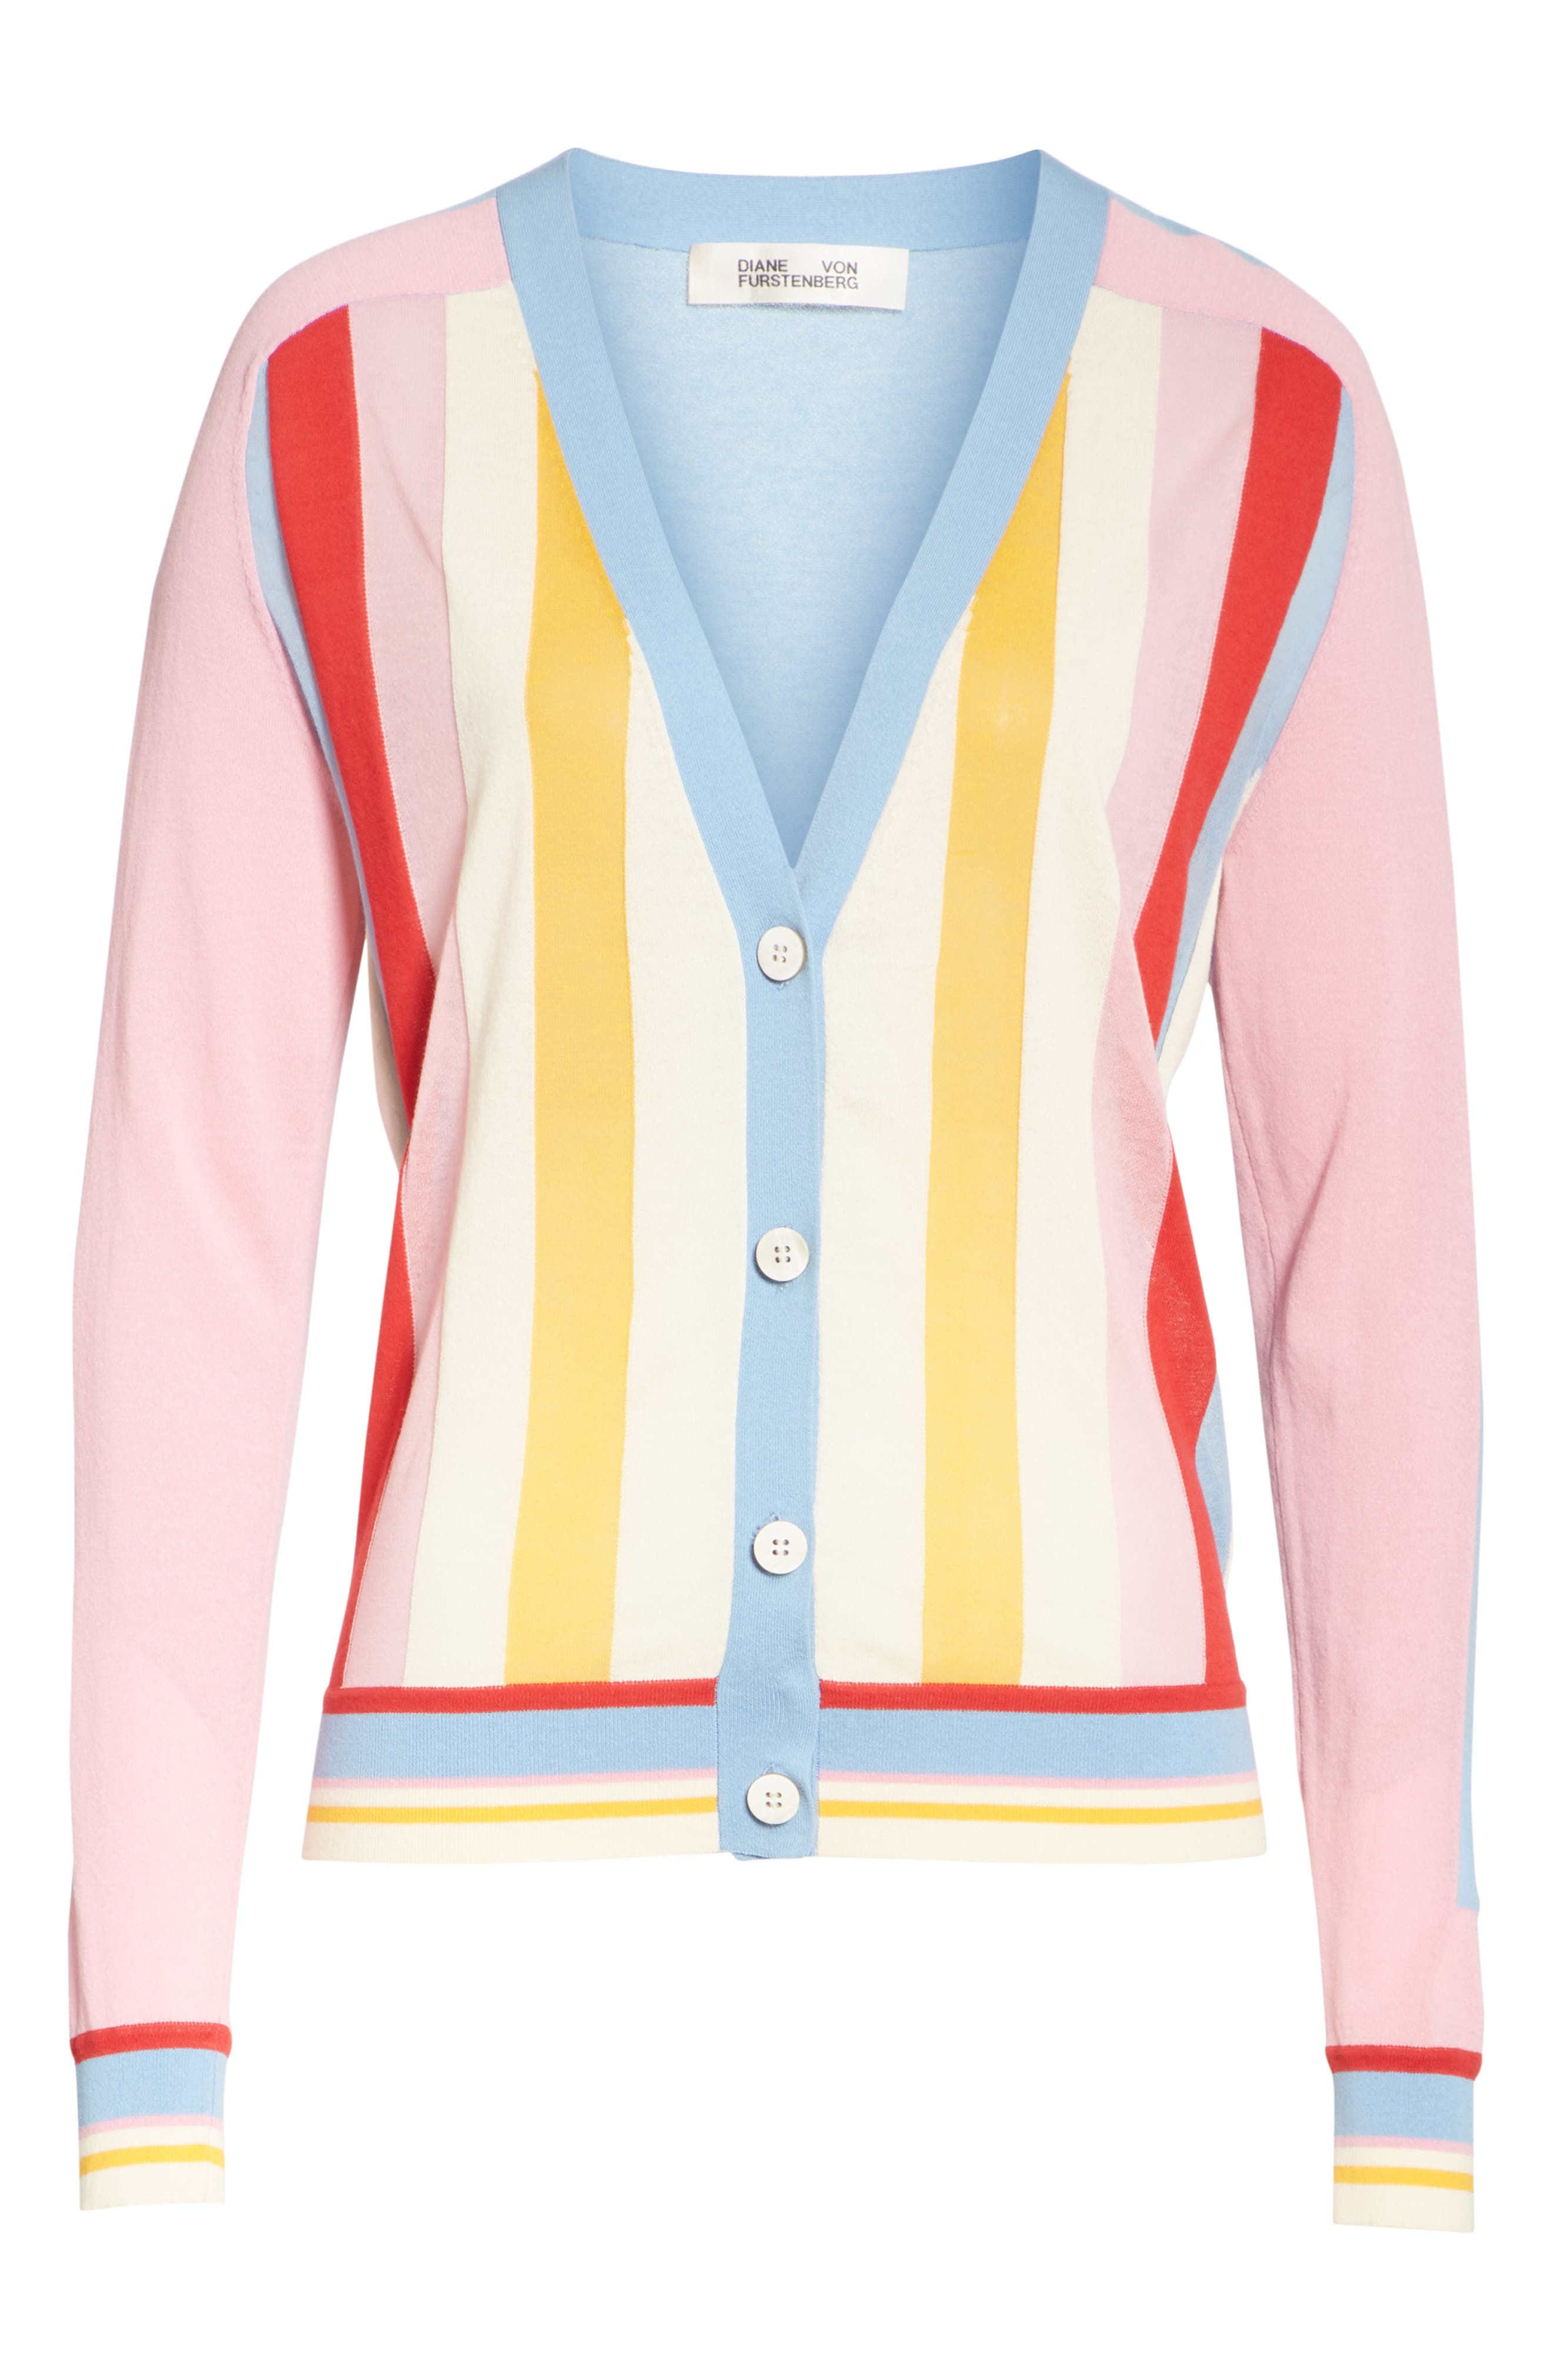 Diane von Furstenberg Colorblock Stripe Cardigan,                             Alternate thumbnail 6, color,                             Taffy Multi